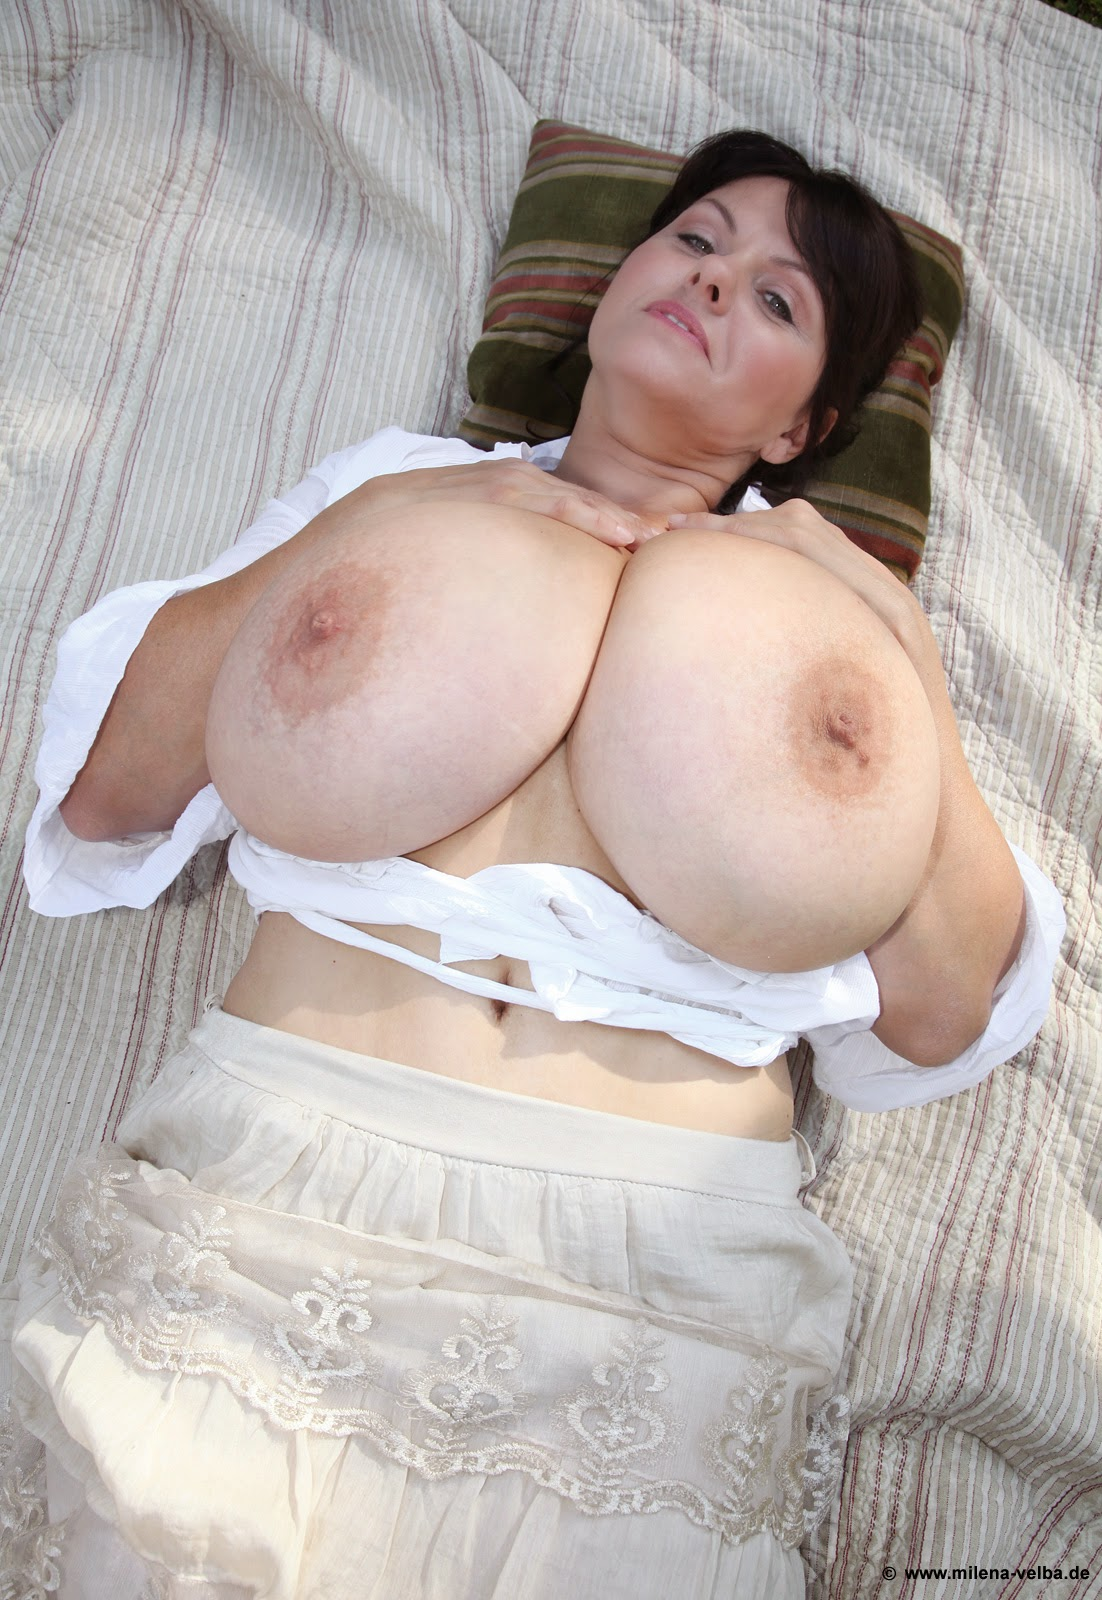 nude girl and boys sex